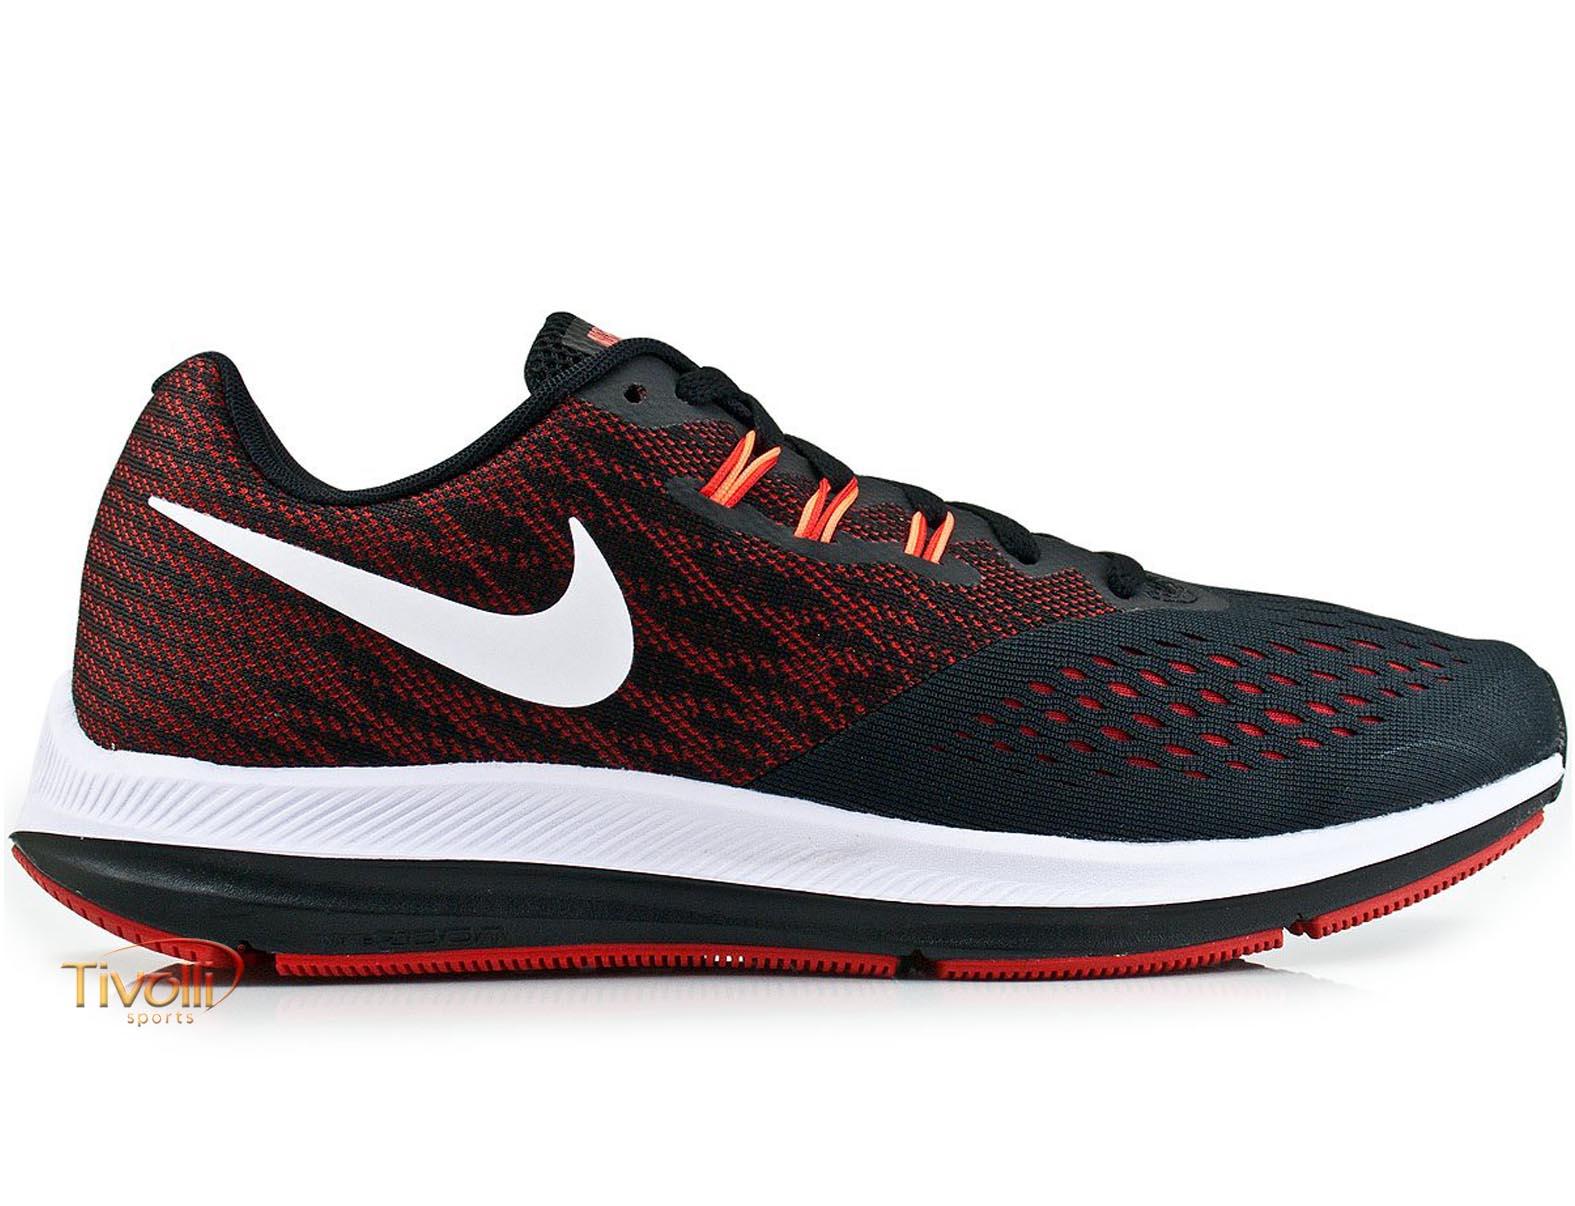 4a28457365e Raquete Mania   Tênis Nike Zoom Winflo 4   Preto